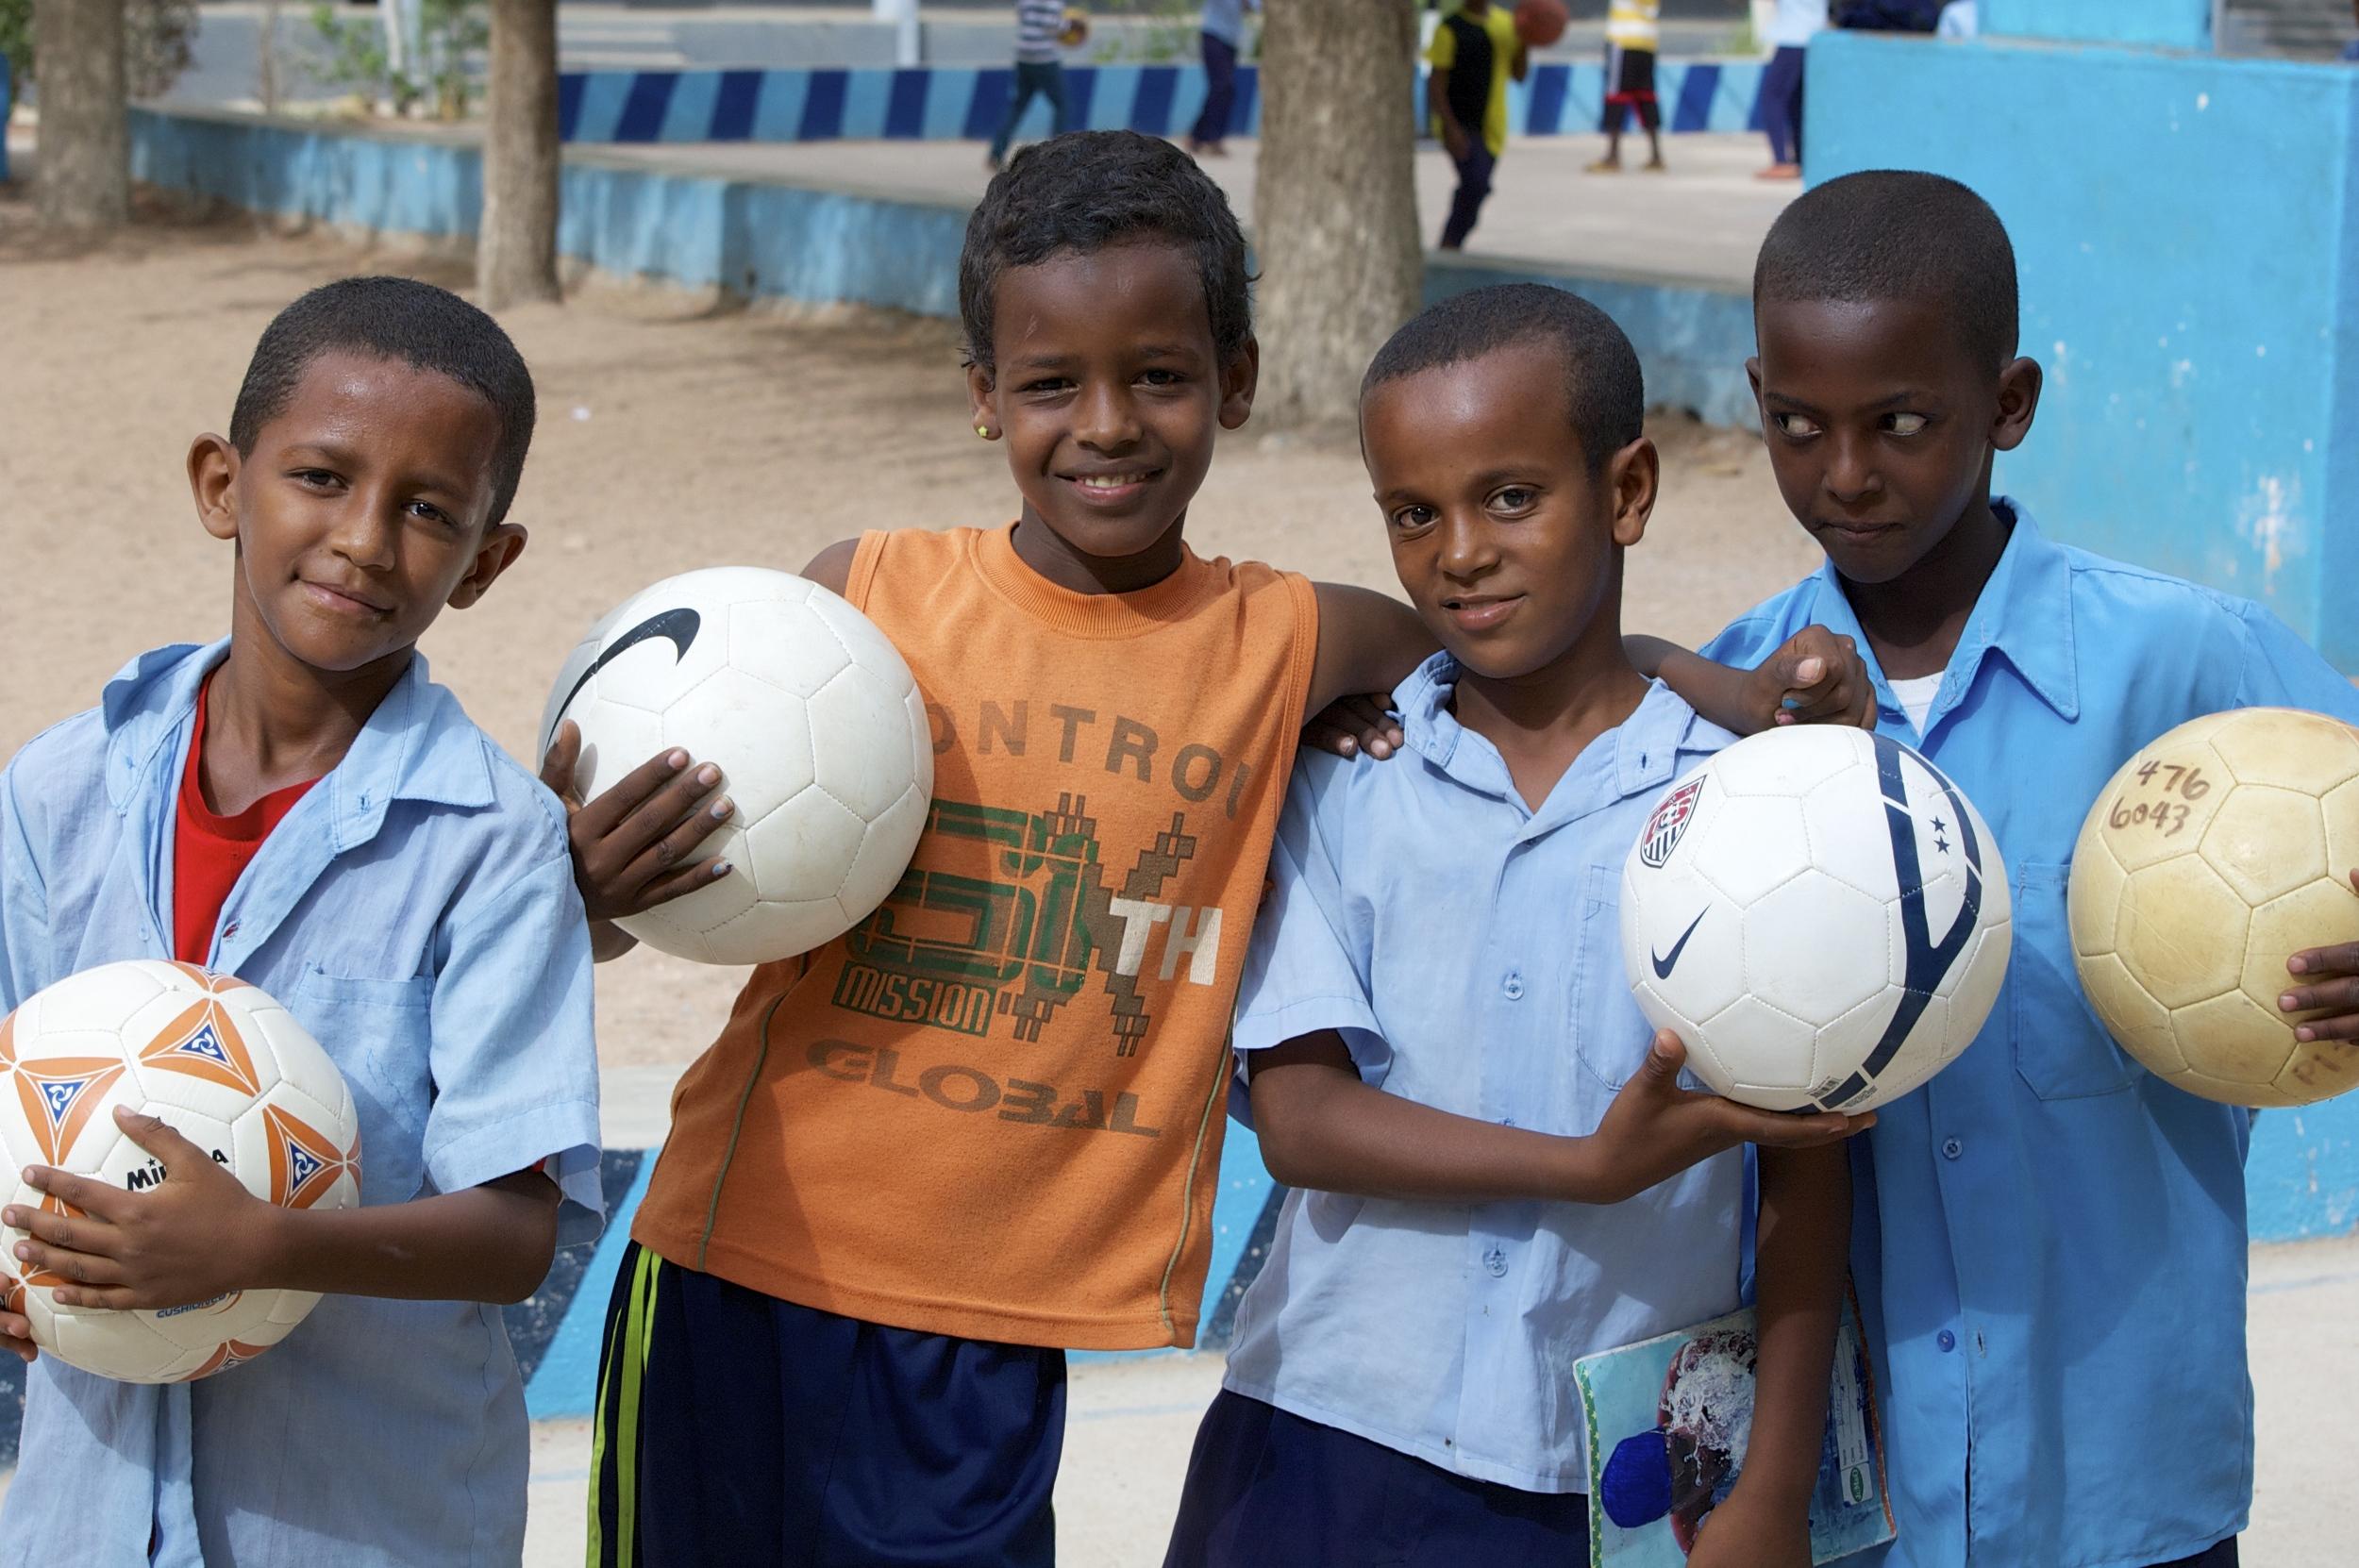 Boys in Ethiopia